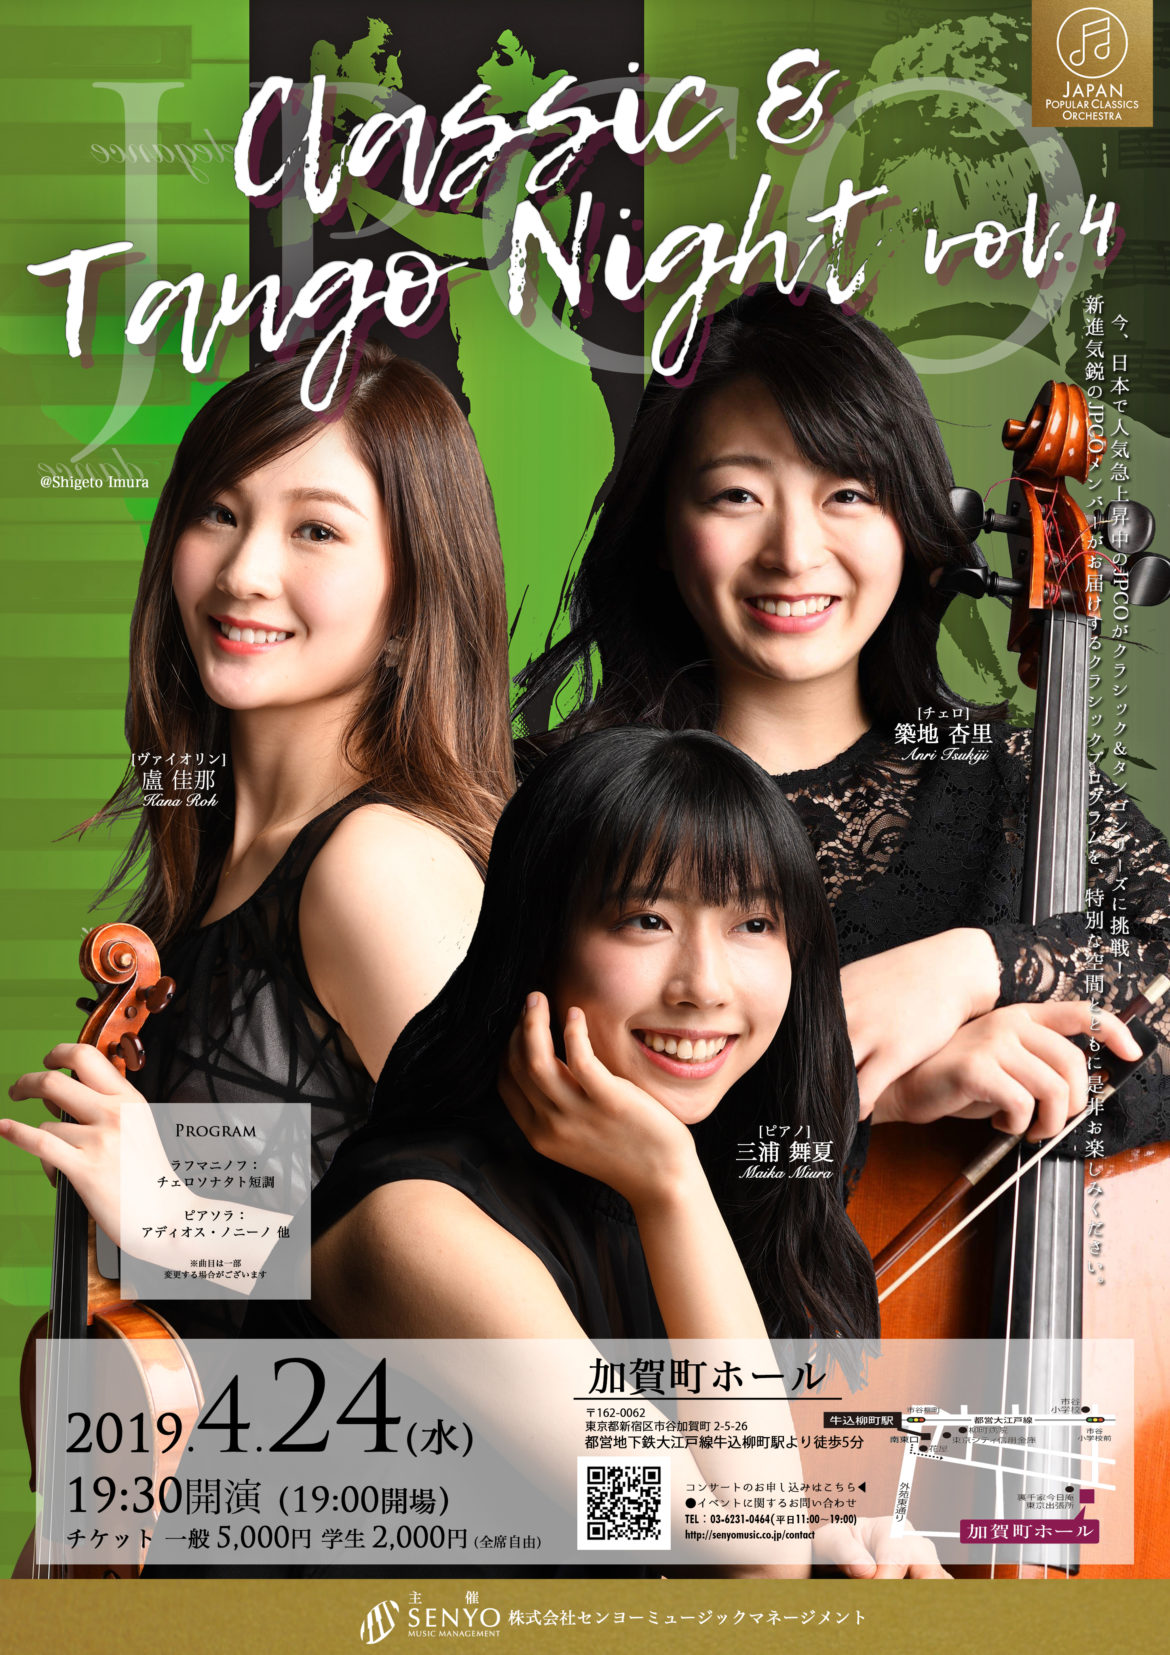 2019.4.24  JPCO CLASSIC & TANGO NIGHT  vol.4